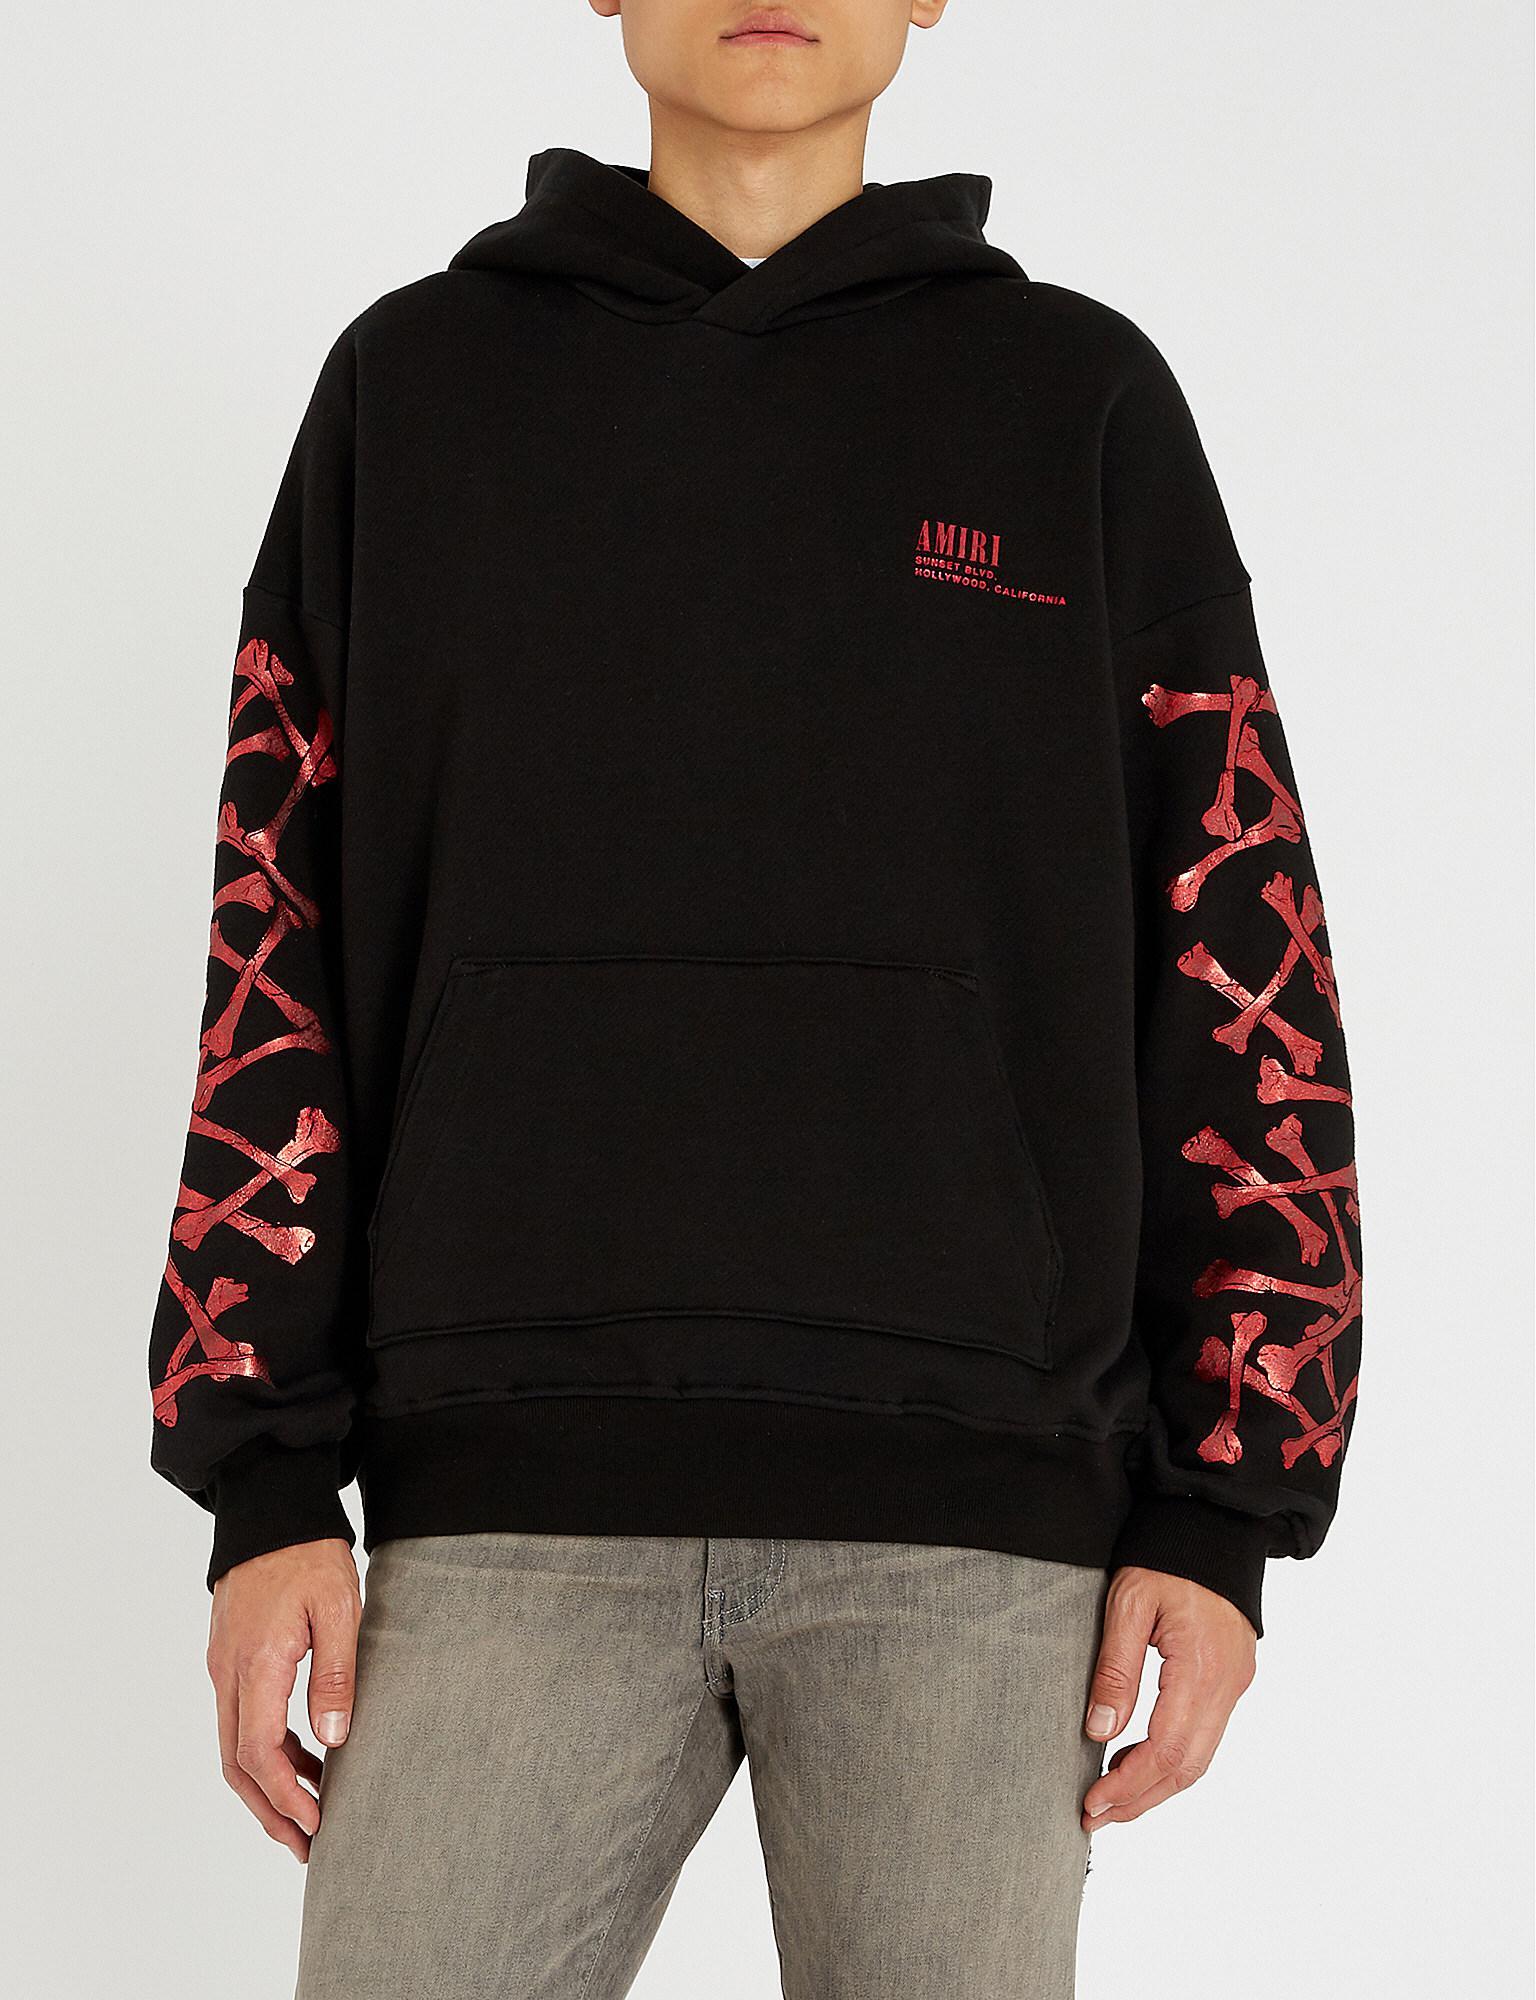 7f8b74f7b7e Amiri - Black Metallic-print Cotton-jersey Hoody for Men - Lyst. View  fullscreen